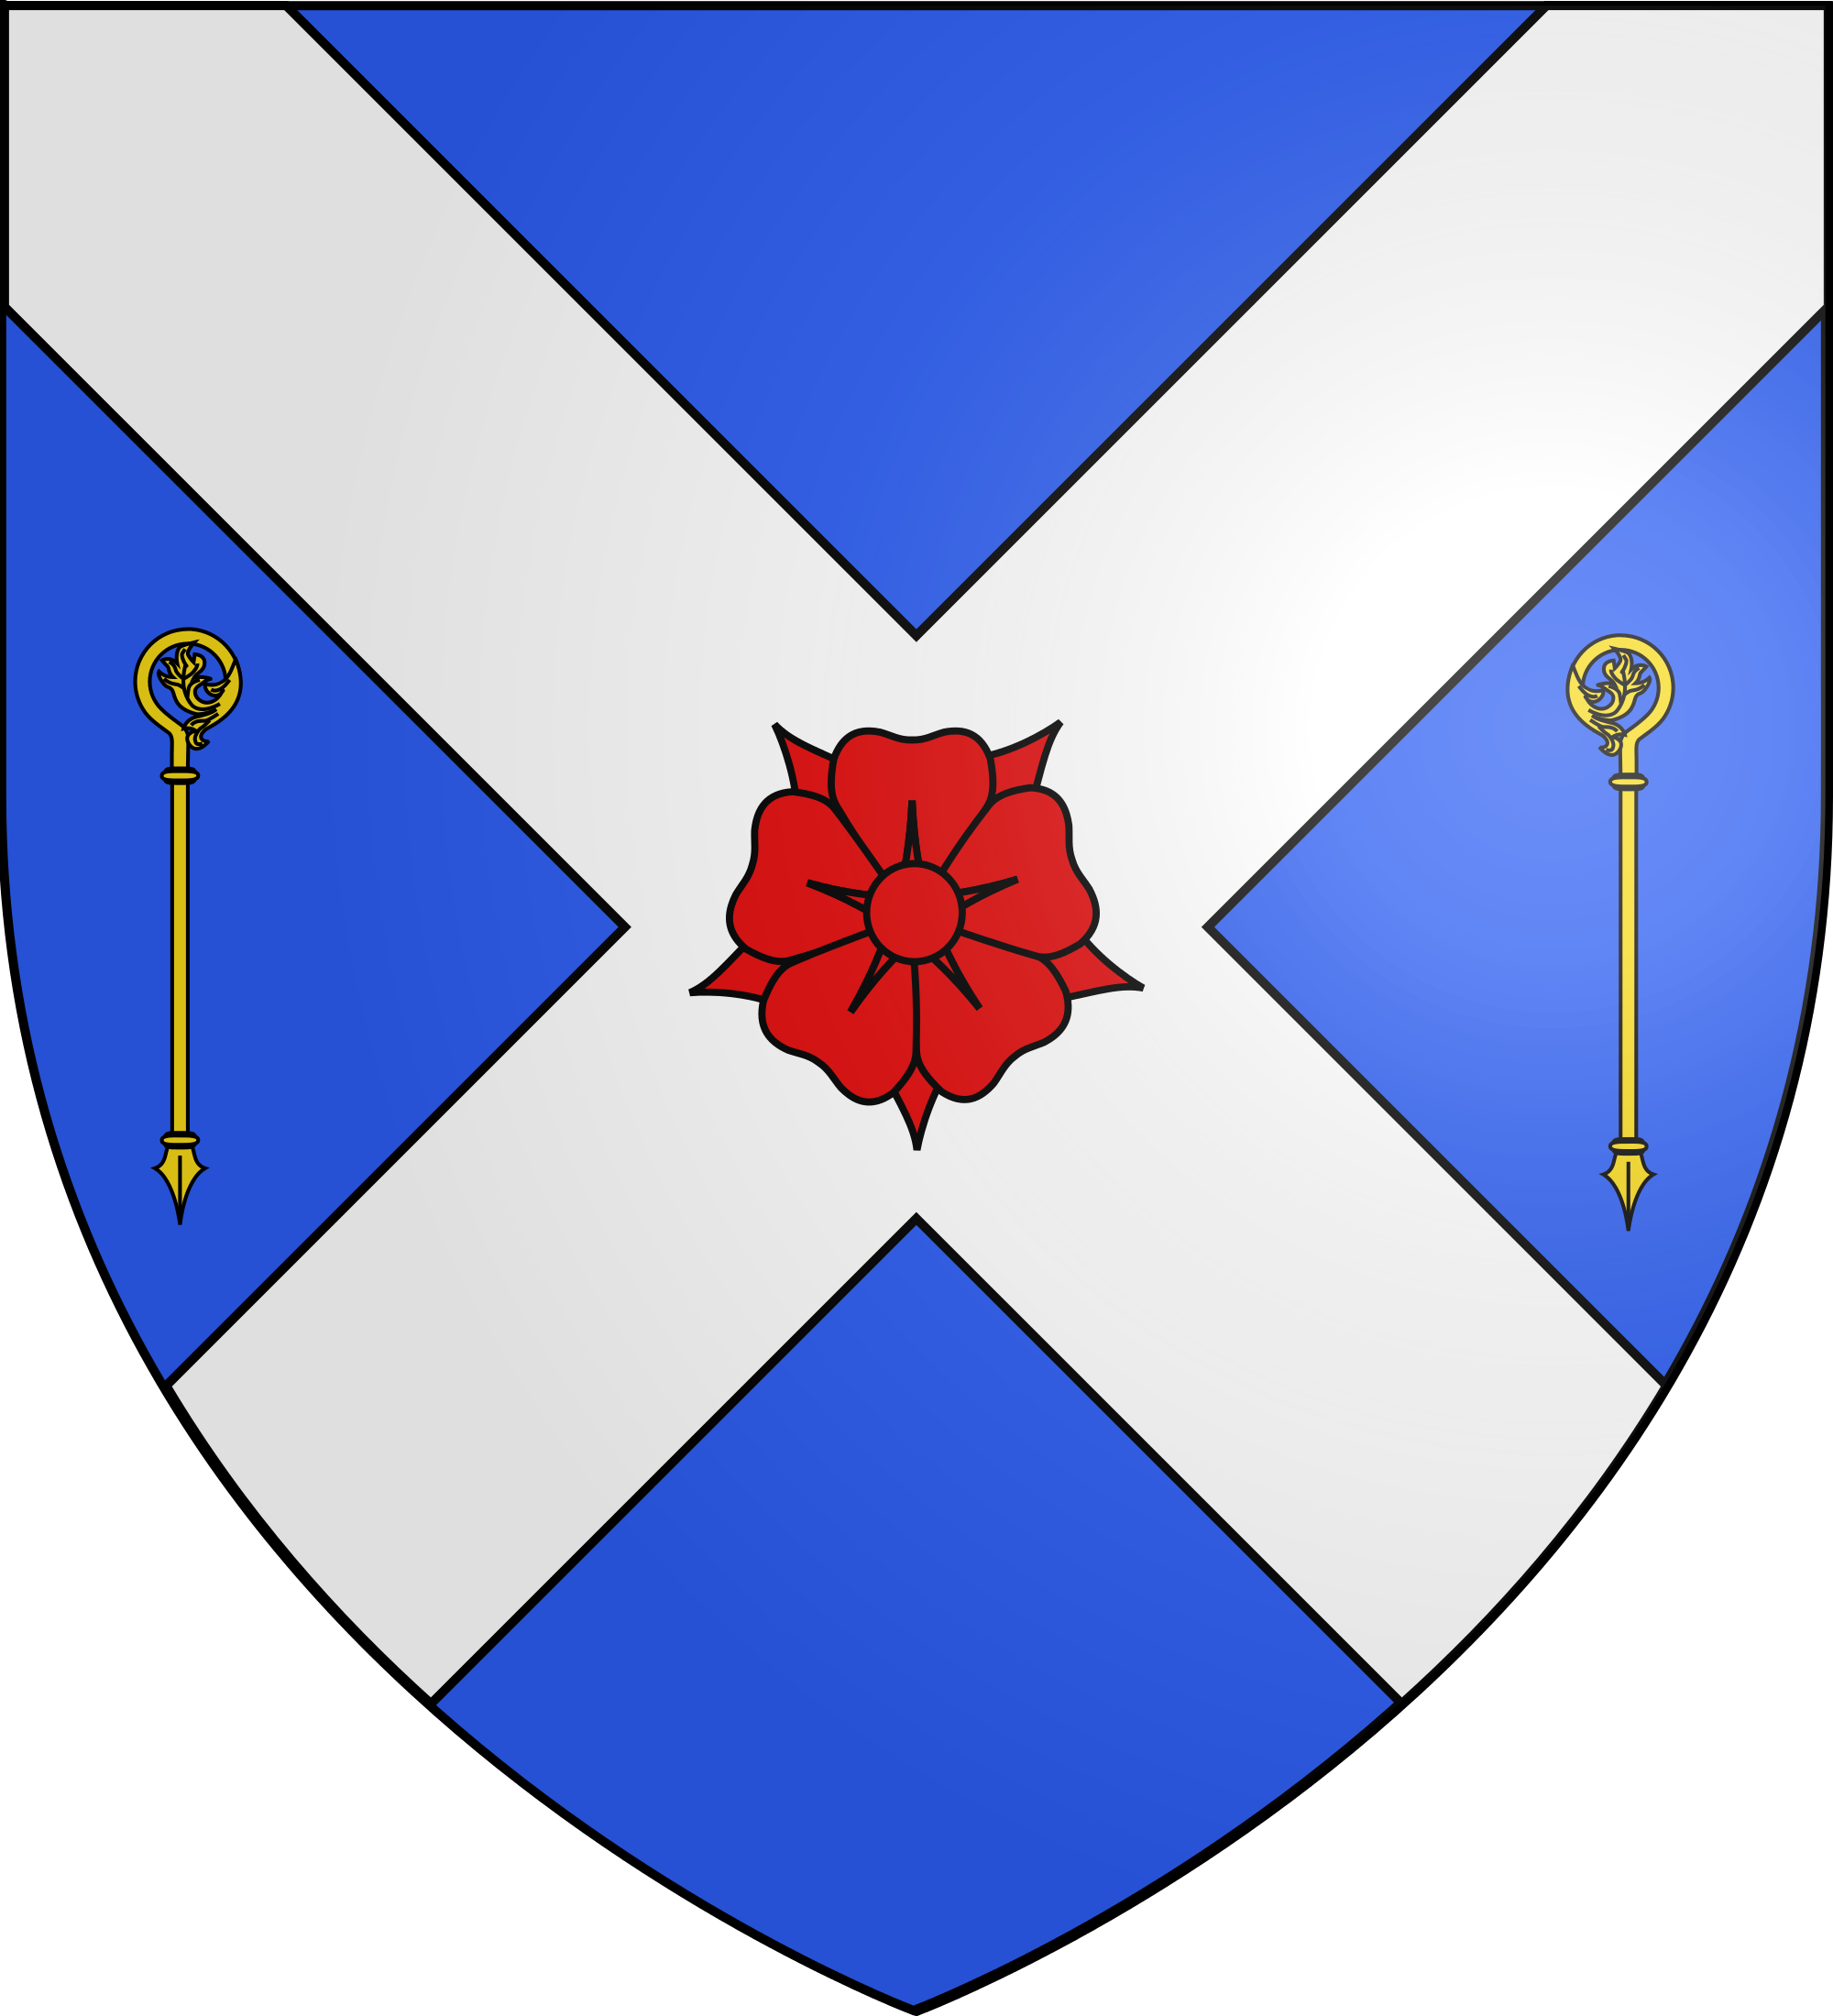 File:Blason ville fr Guilly(Loiret).svg.